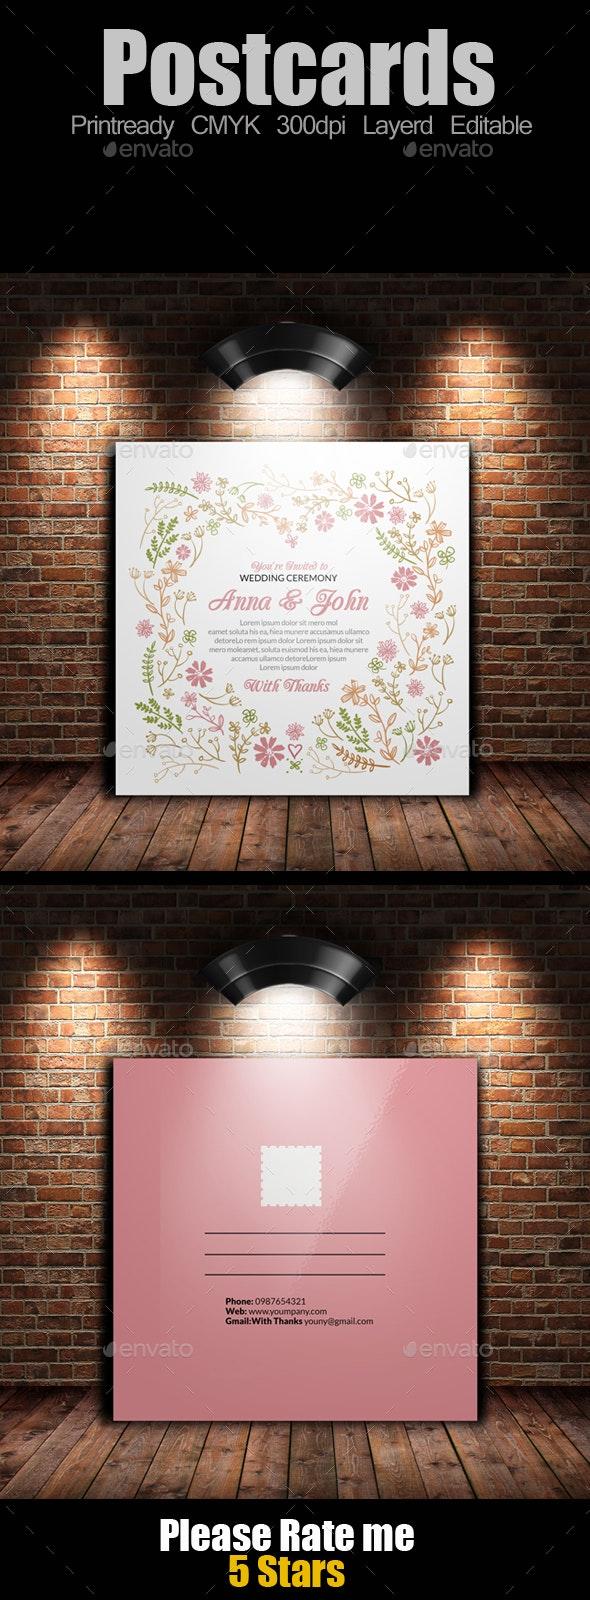 Square Wedding Postcard - Weddings Cards & Invites